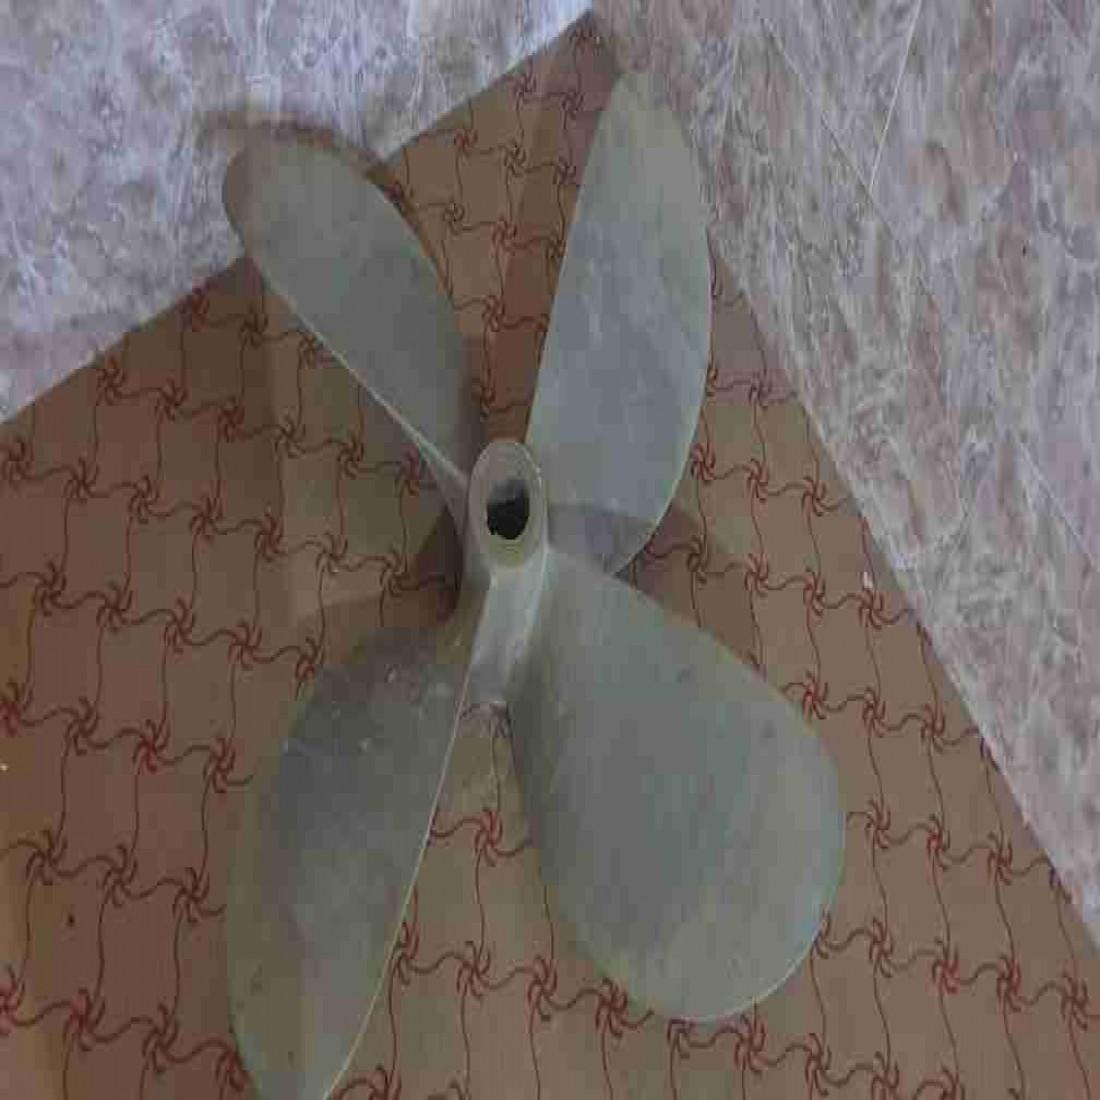 پروانه لنج